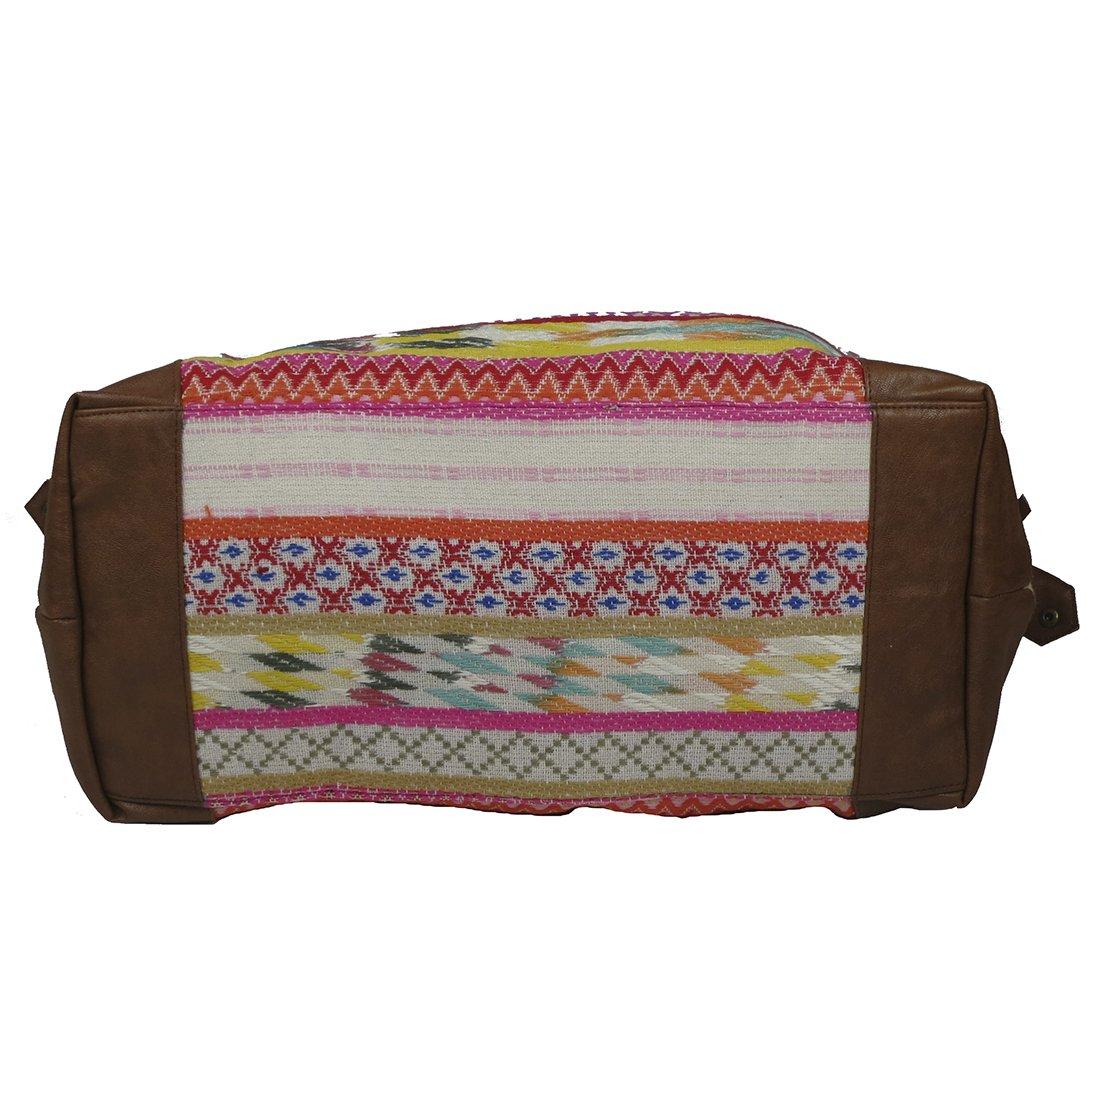 Raj Pink Multi Ethnic Print Duffle Bag Weekender with Leather by Raj Imports (Image #4)